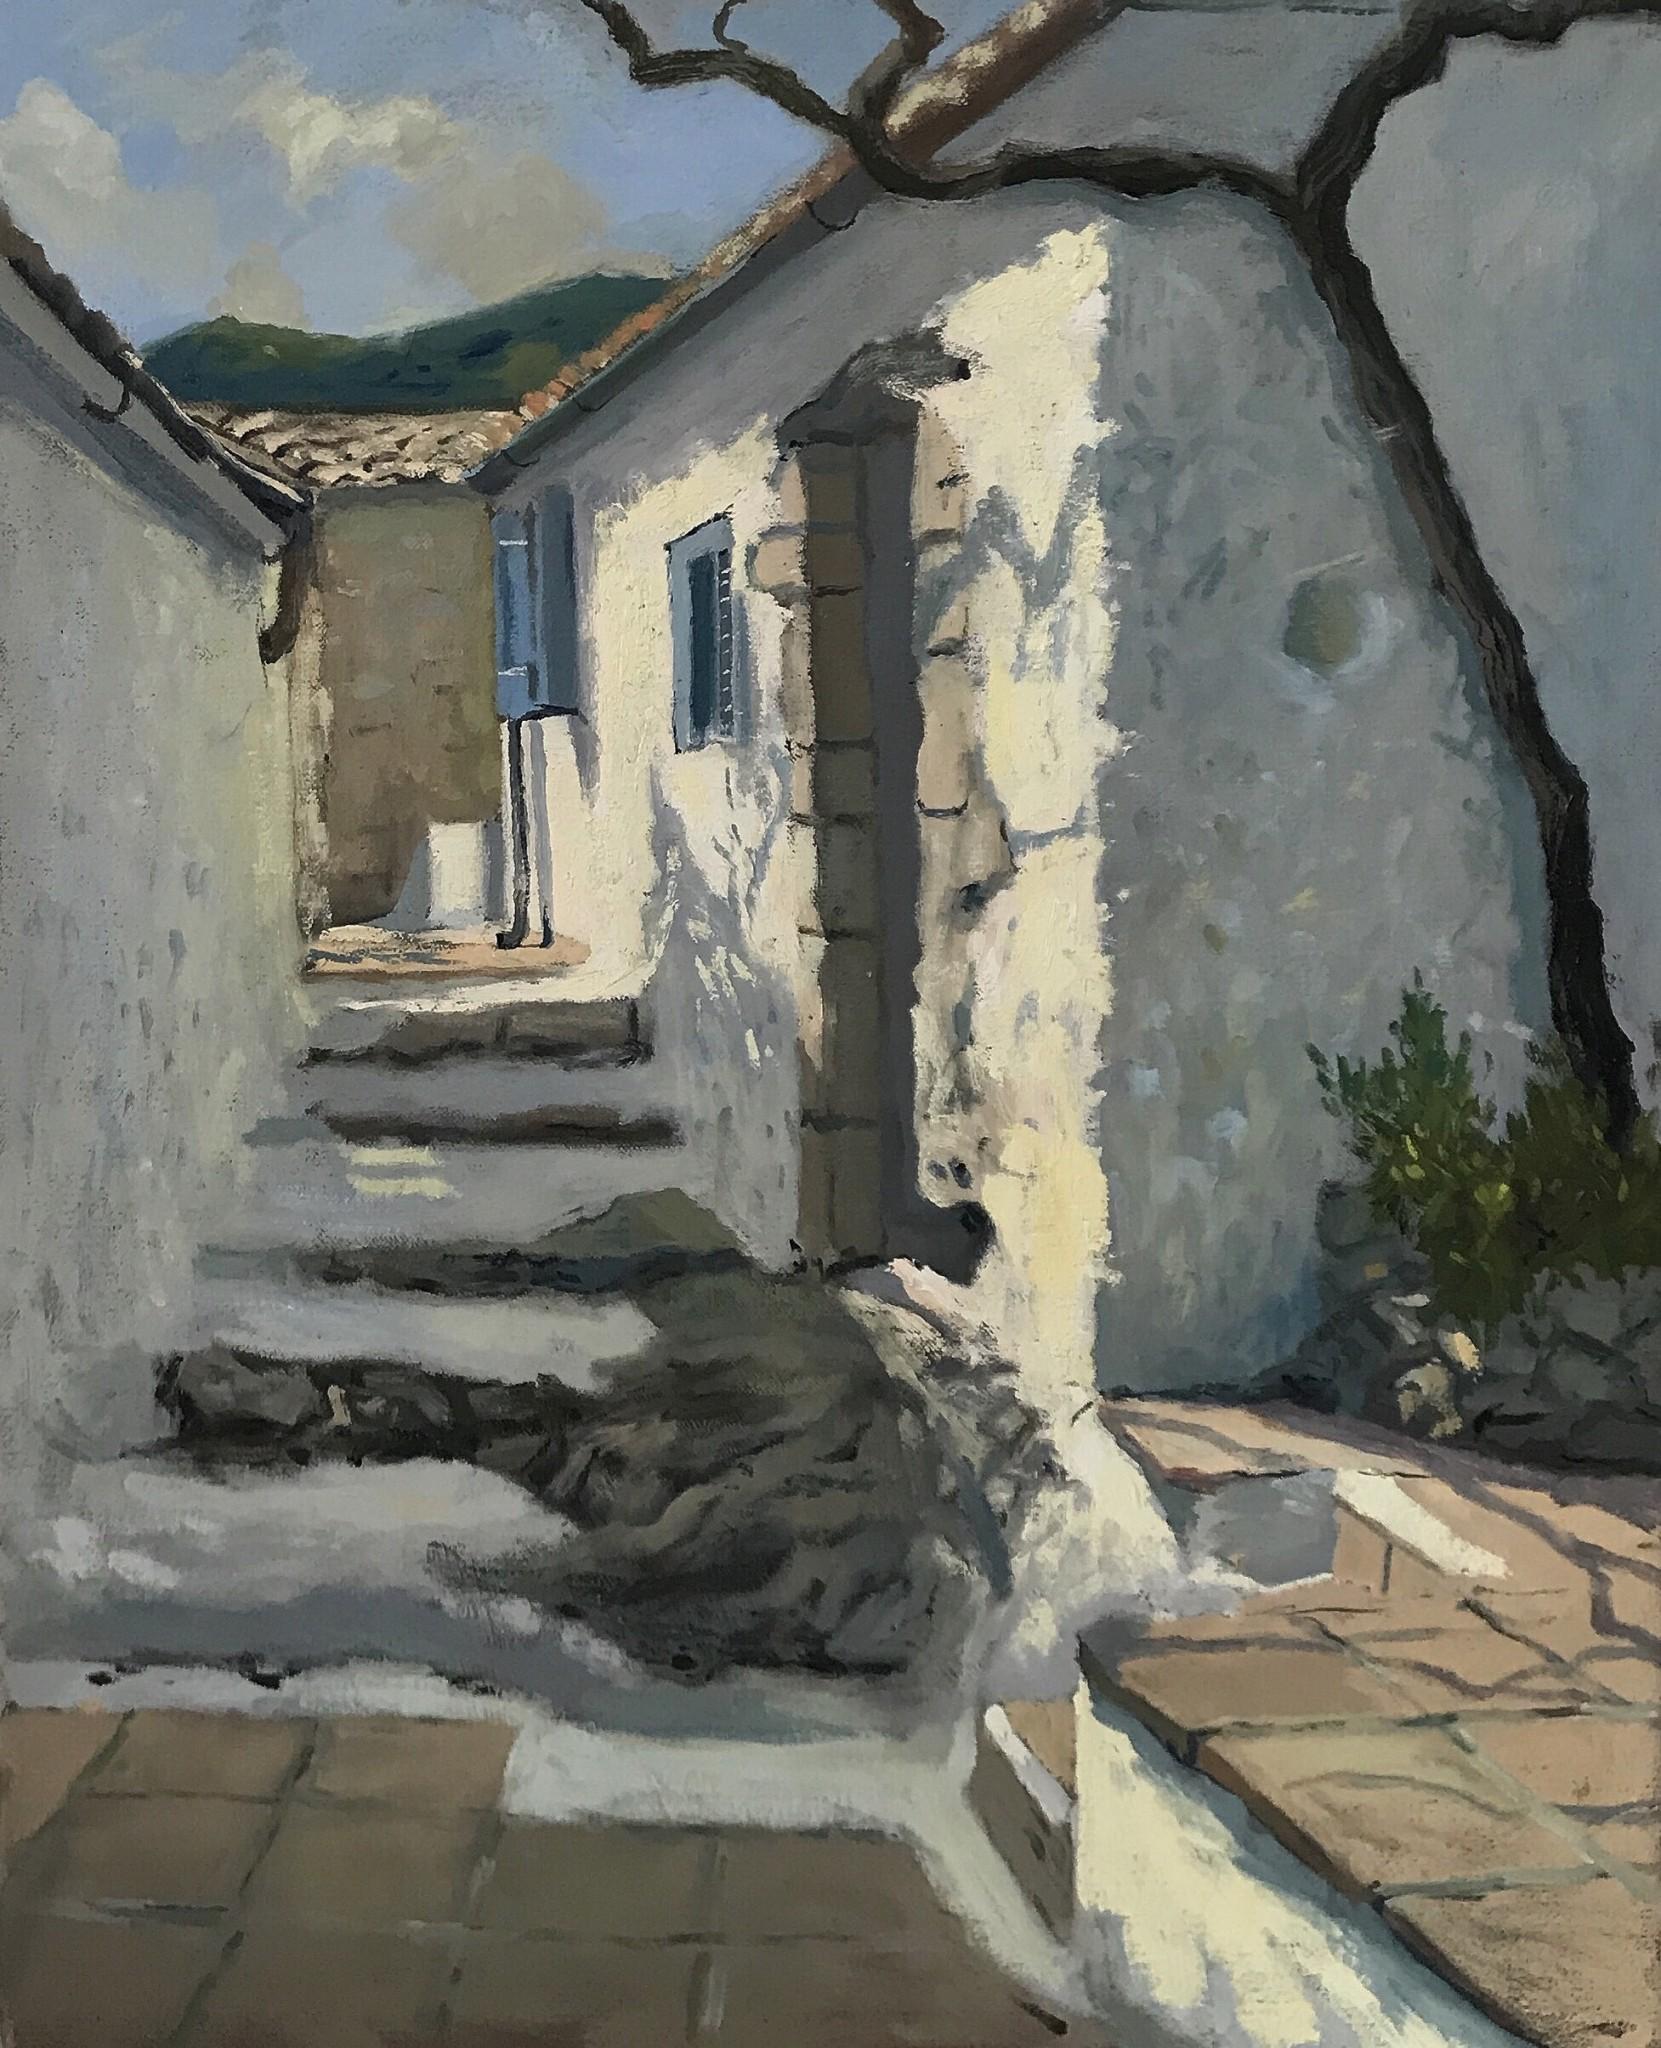 Afternoon Light on the White Walls, Zakynthos Villa